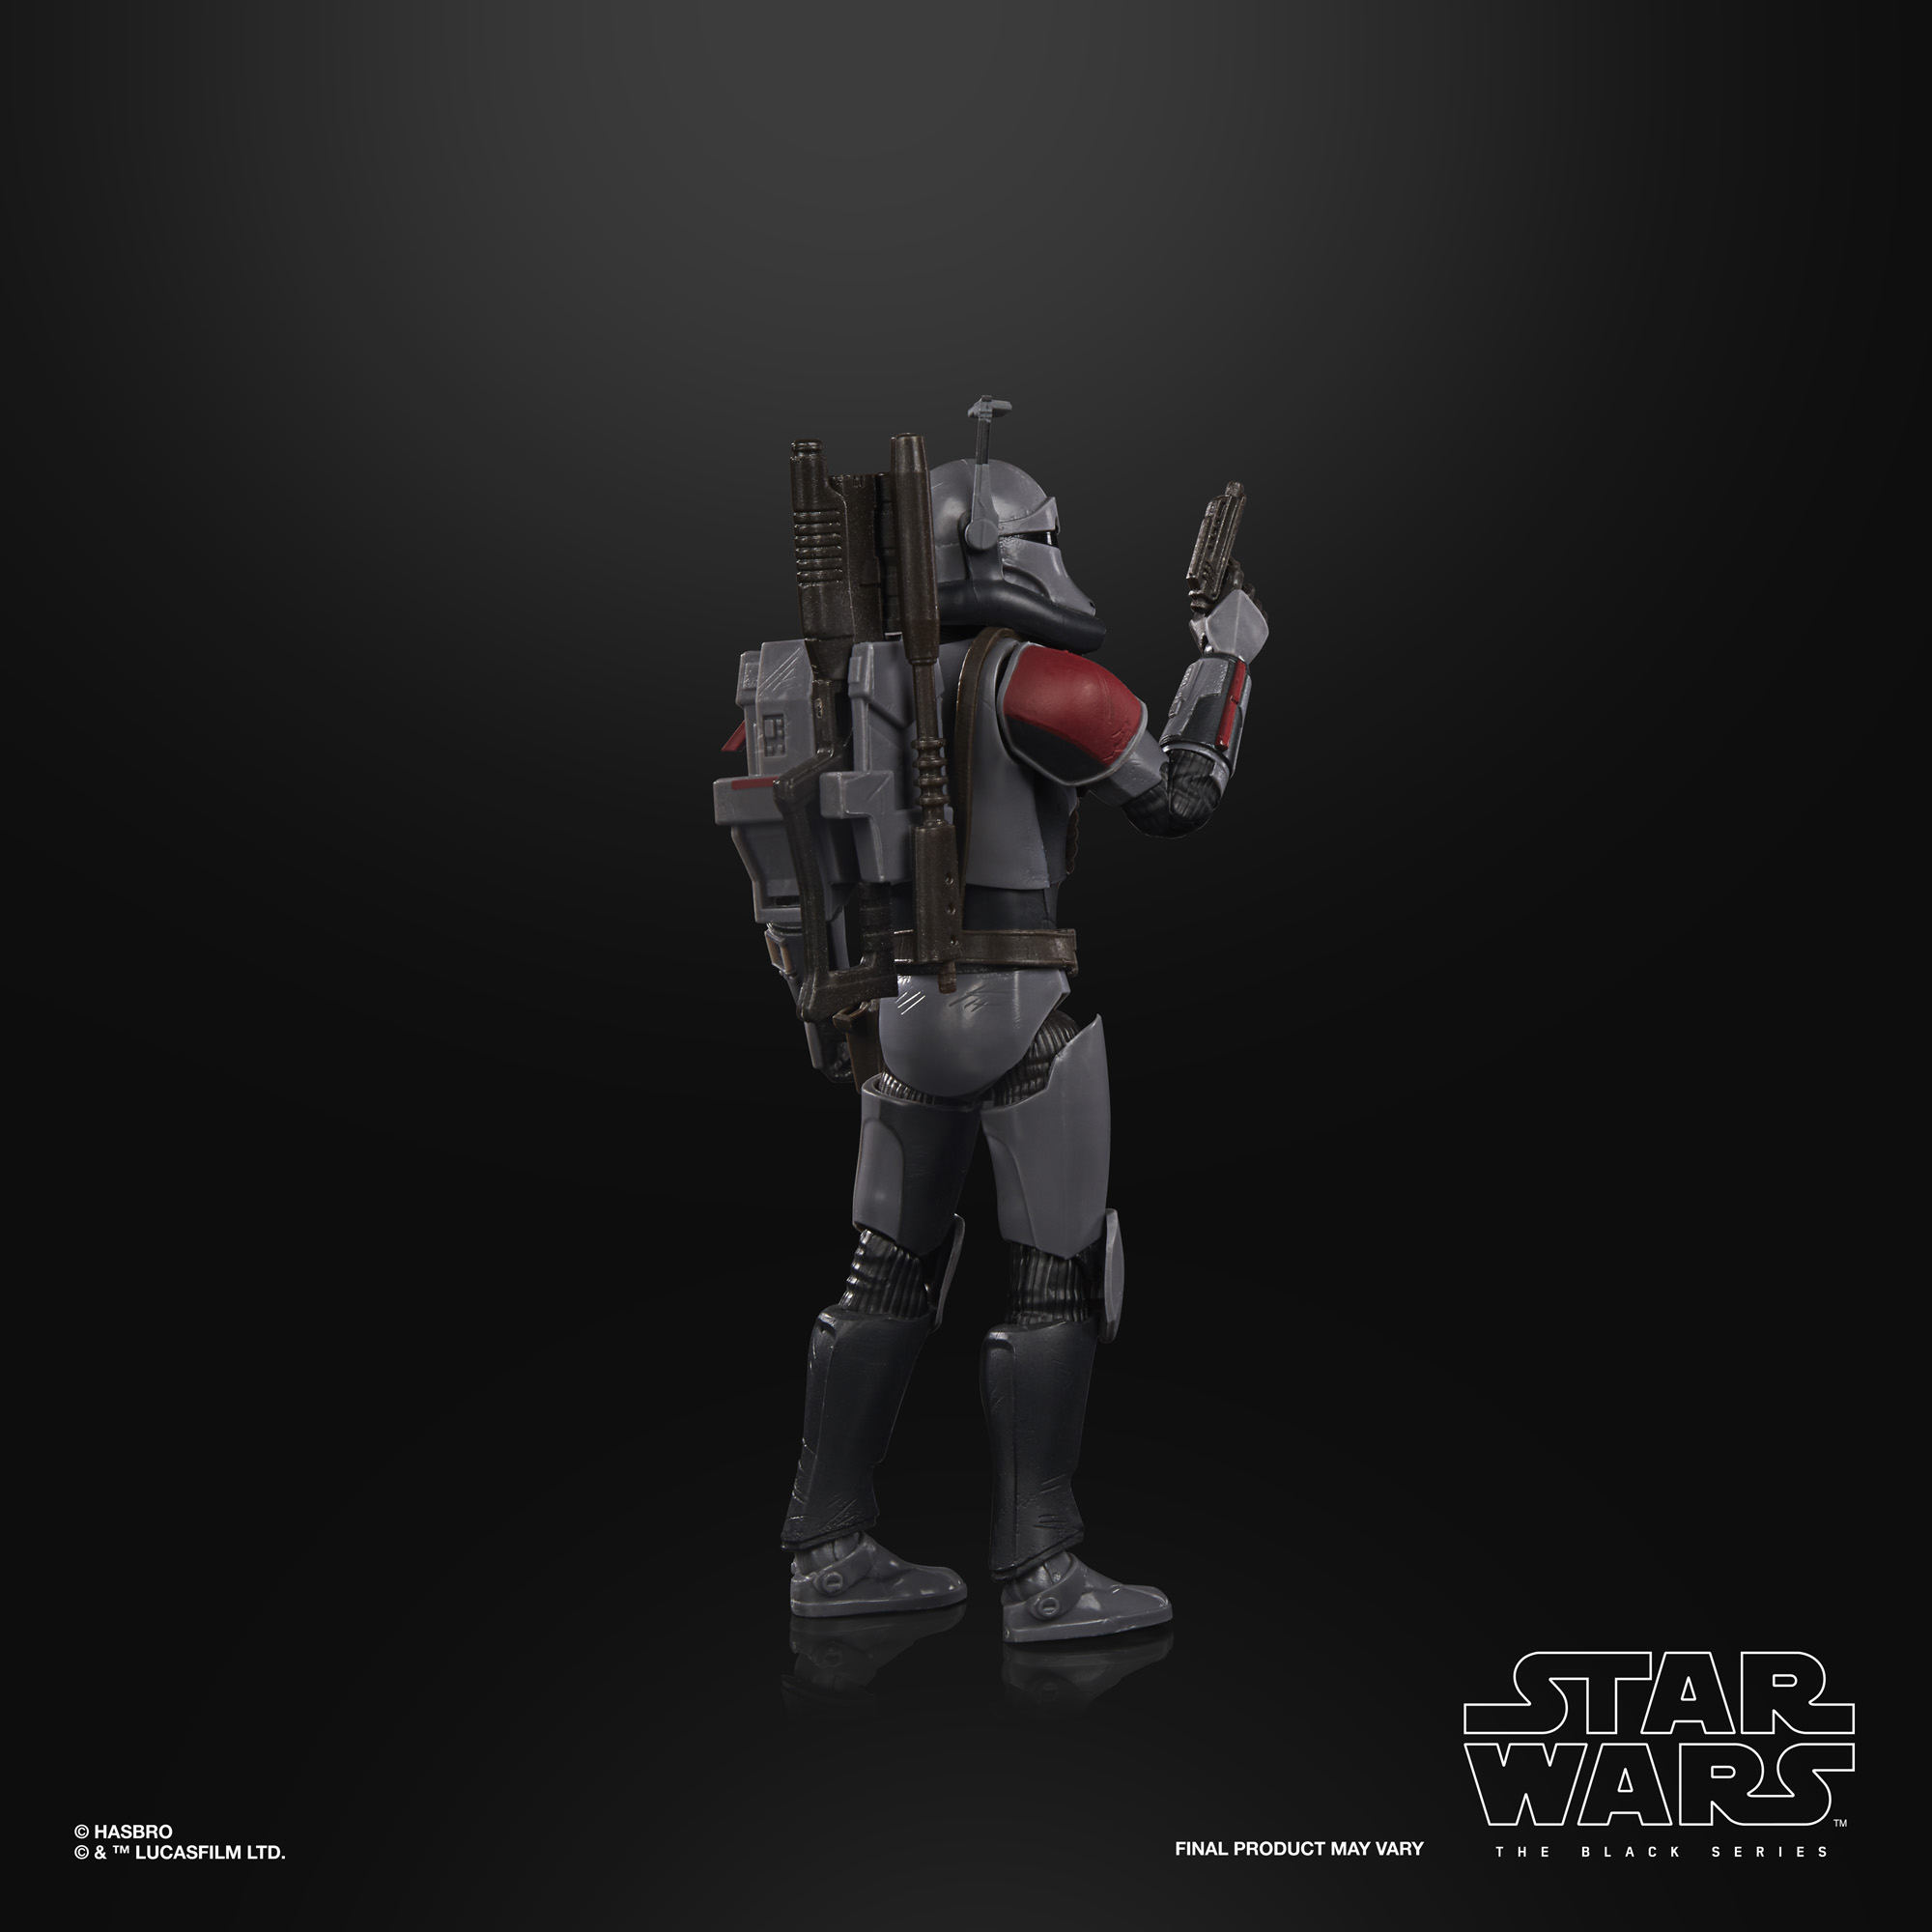 Star Wars - The Black Series - The Clone Wars - Crosshair Action Figure